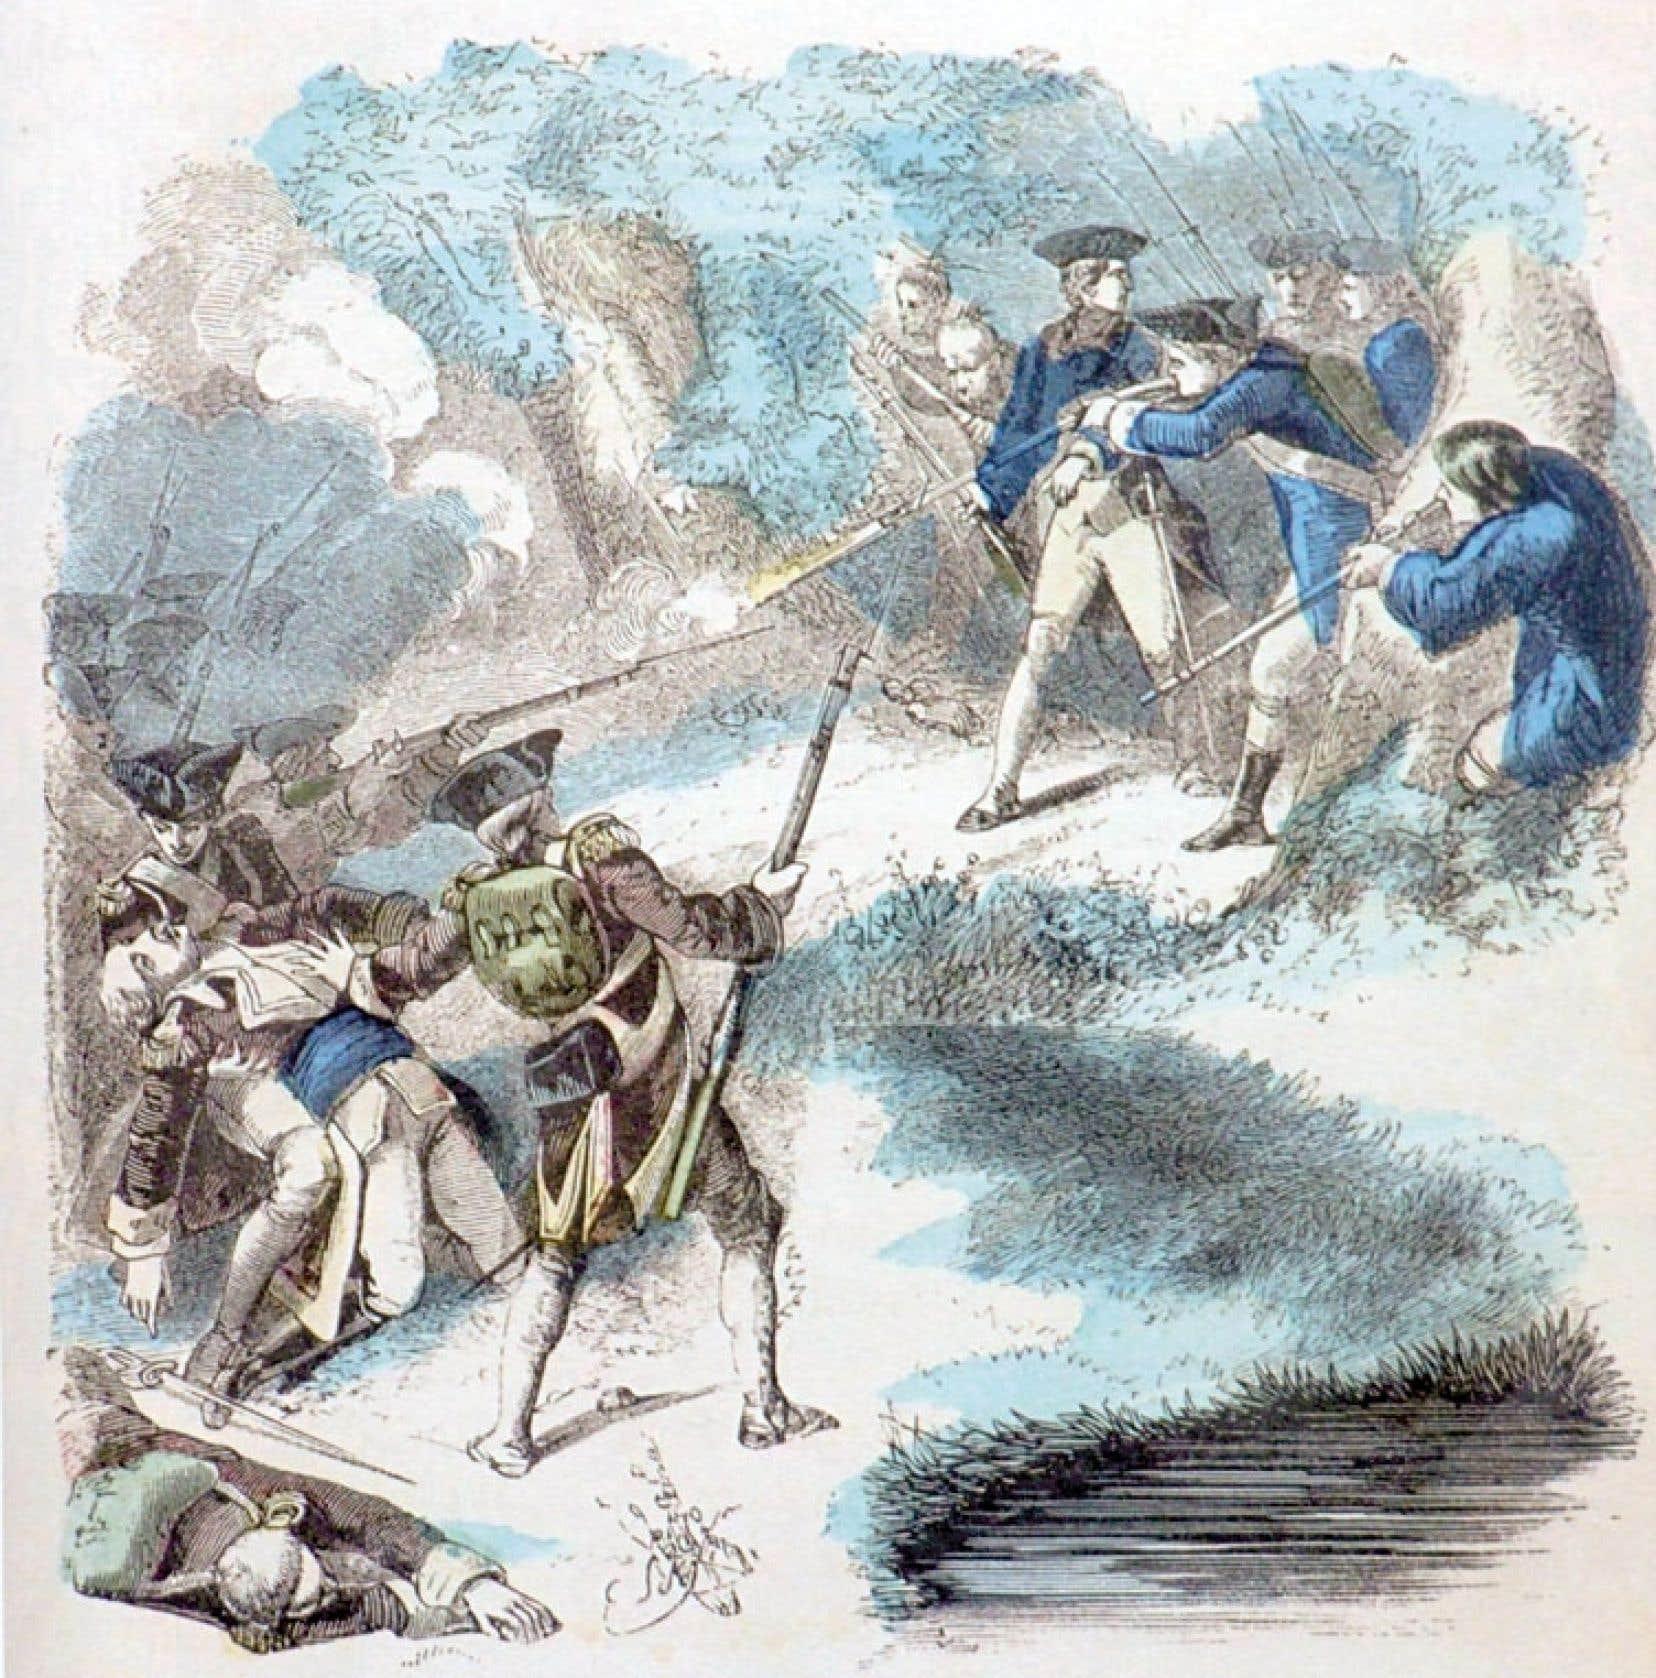 Gravure tirée de The Illustrated Life of George Washington, 1859.